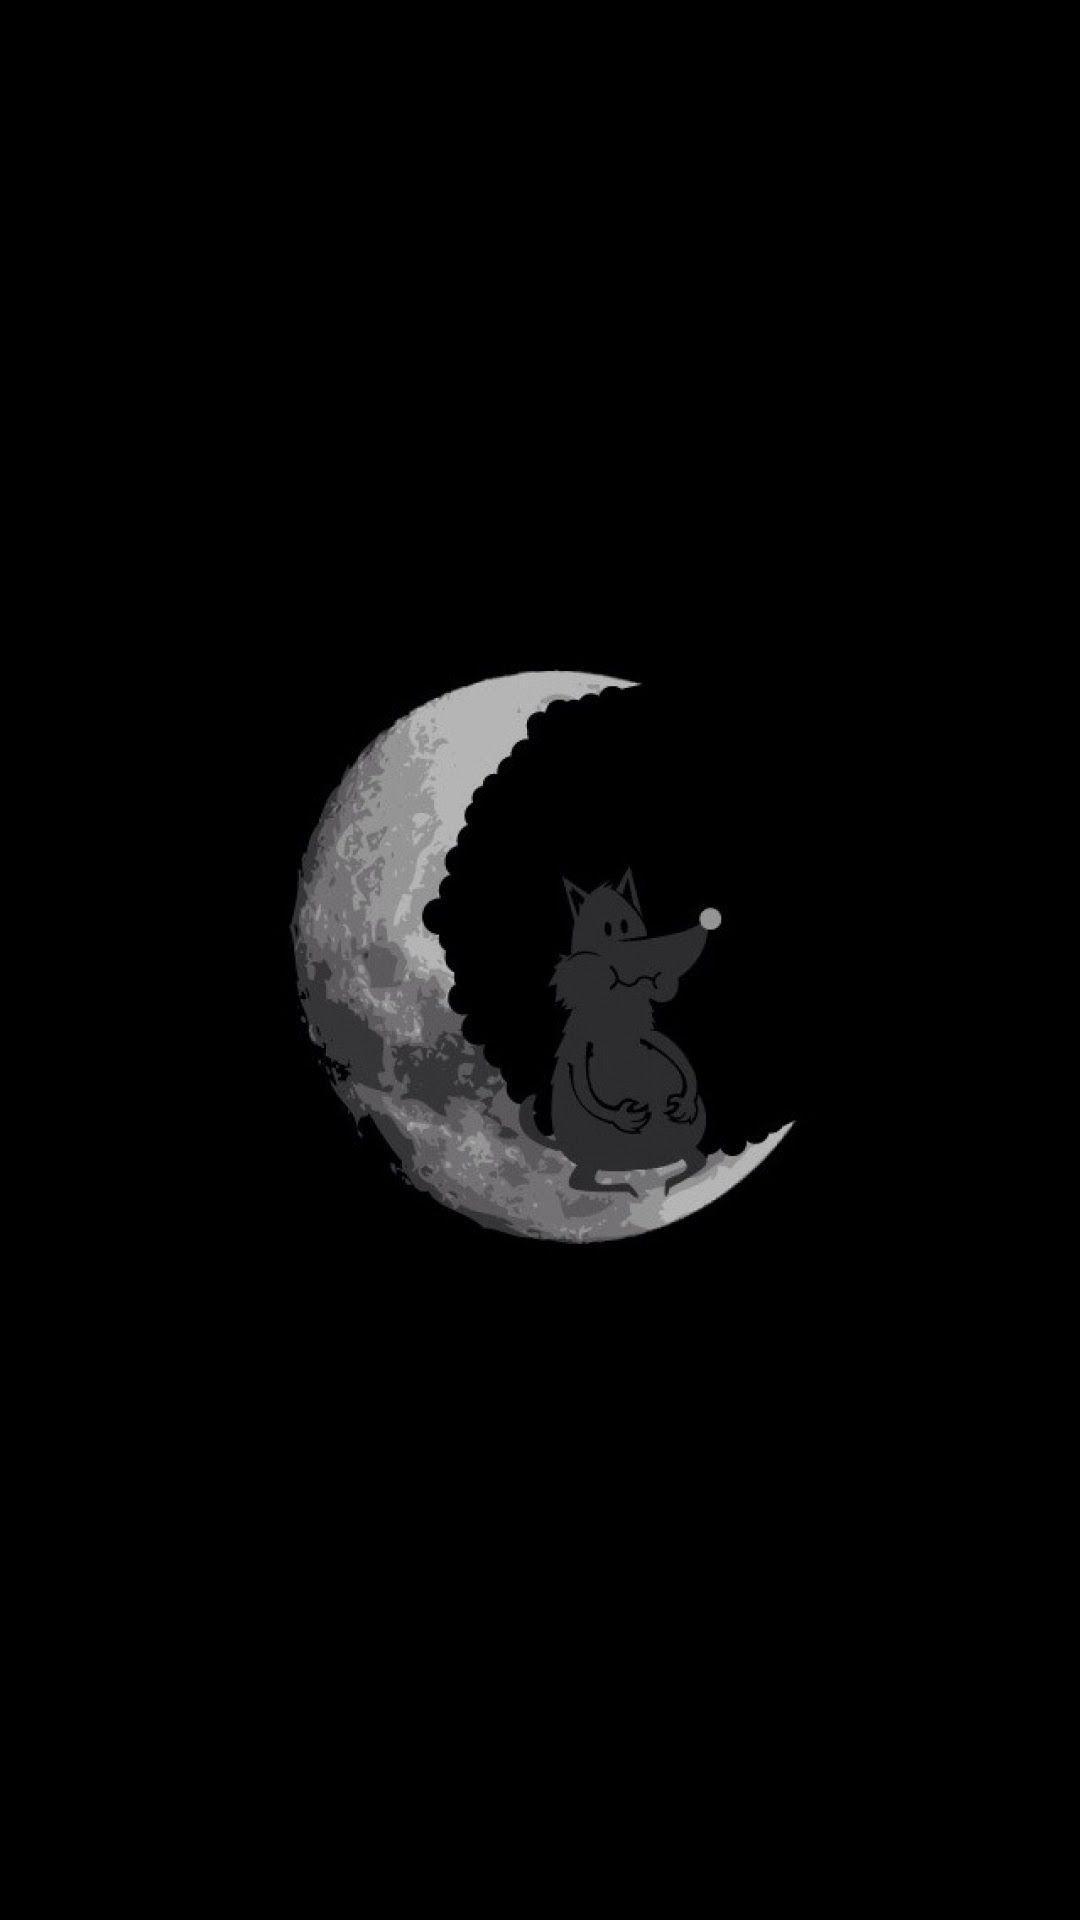 Moon Cartoon Wallpapers Top Free Moon Cartoon Backgrounds Wallpaperaccess